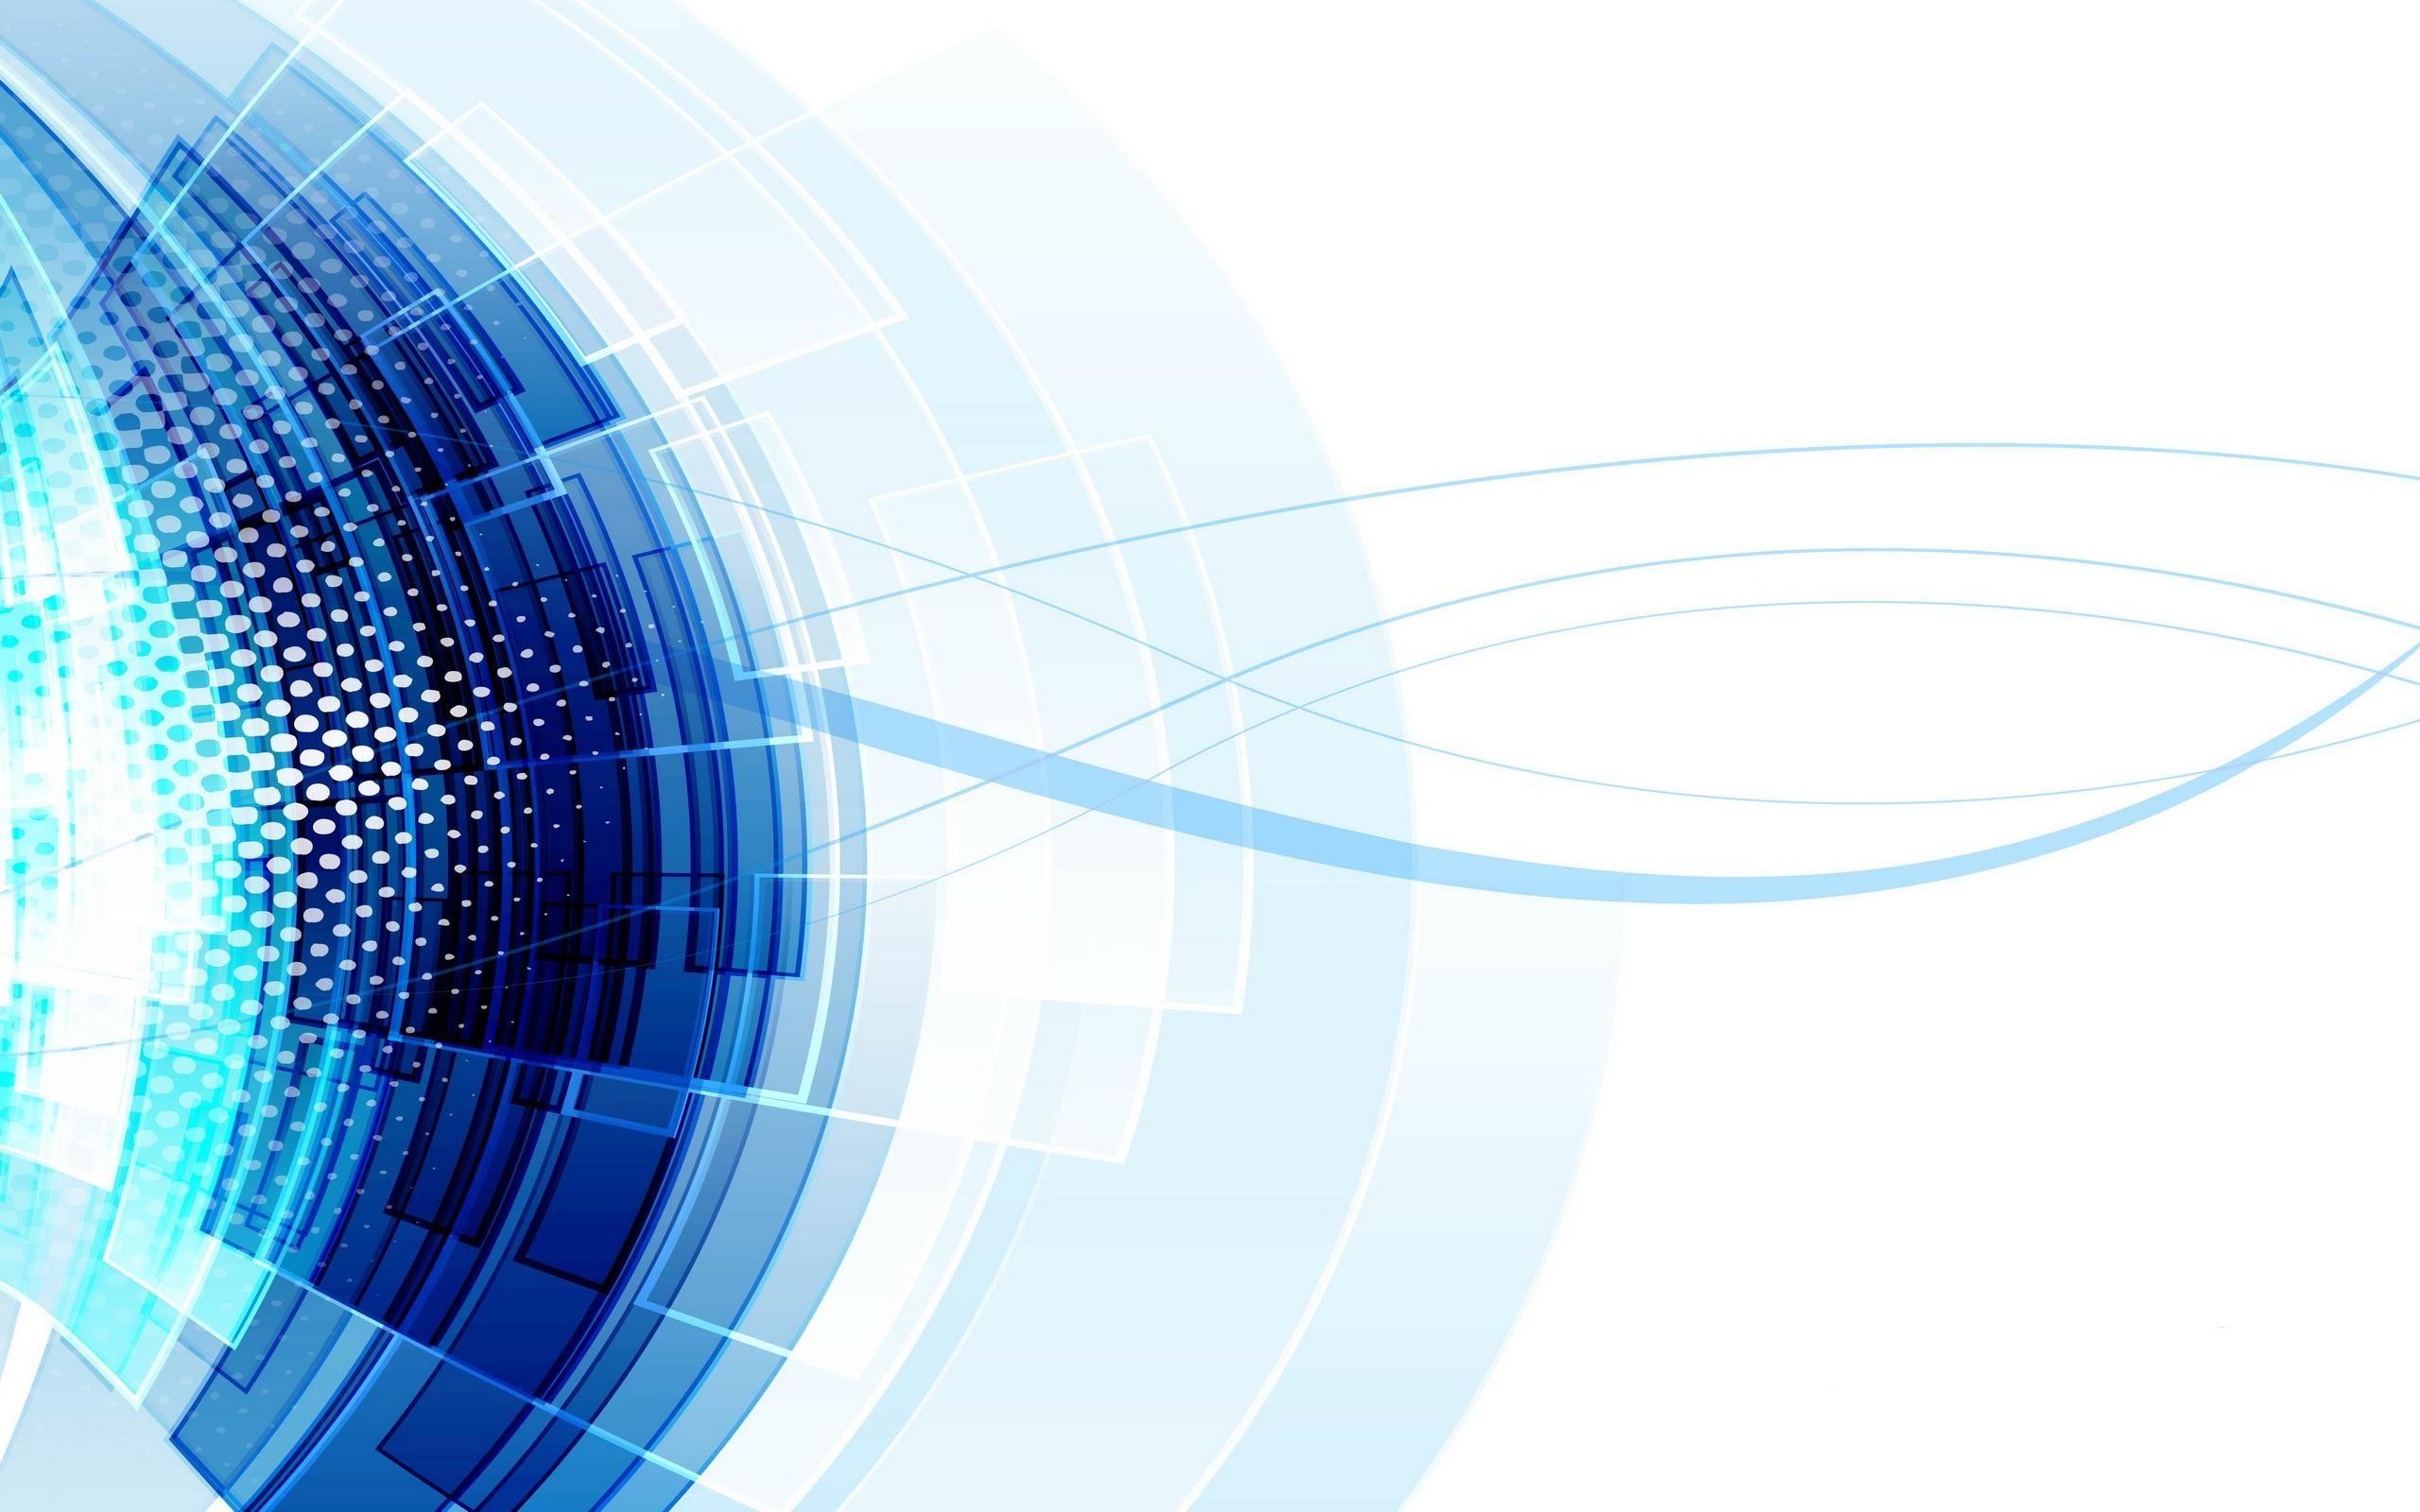 Blue Abstract Wave Vector Wallpaper Download Free Vector Art